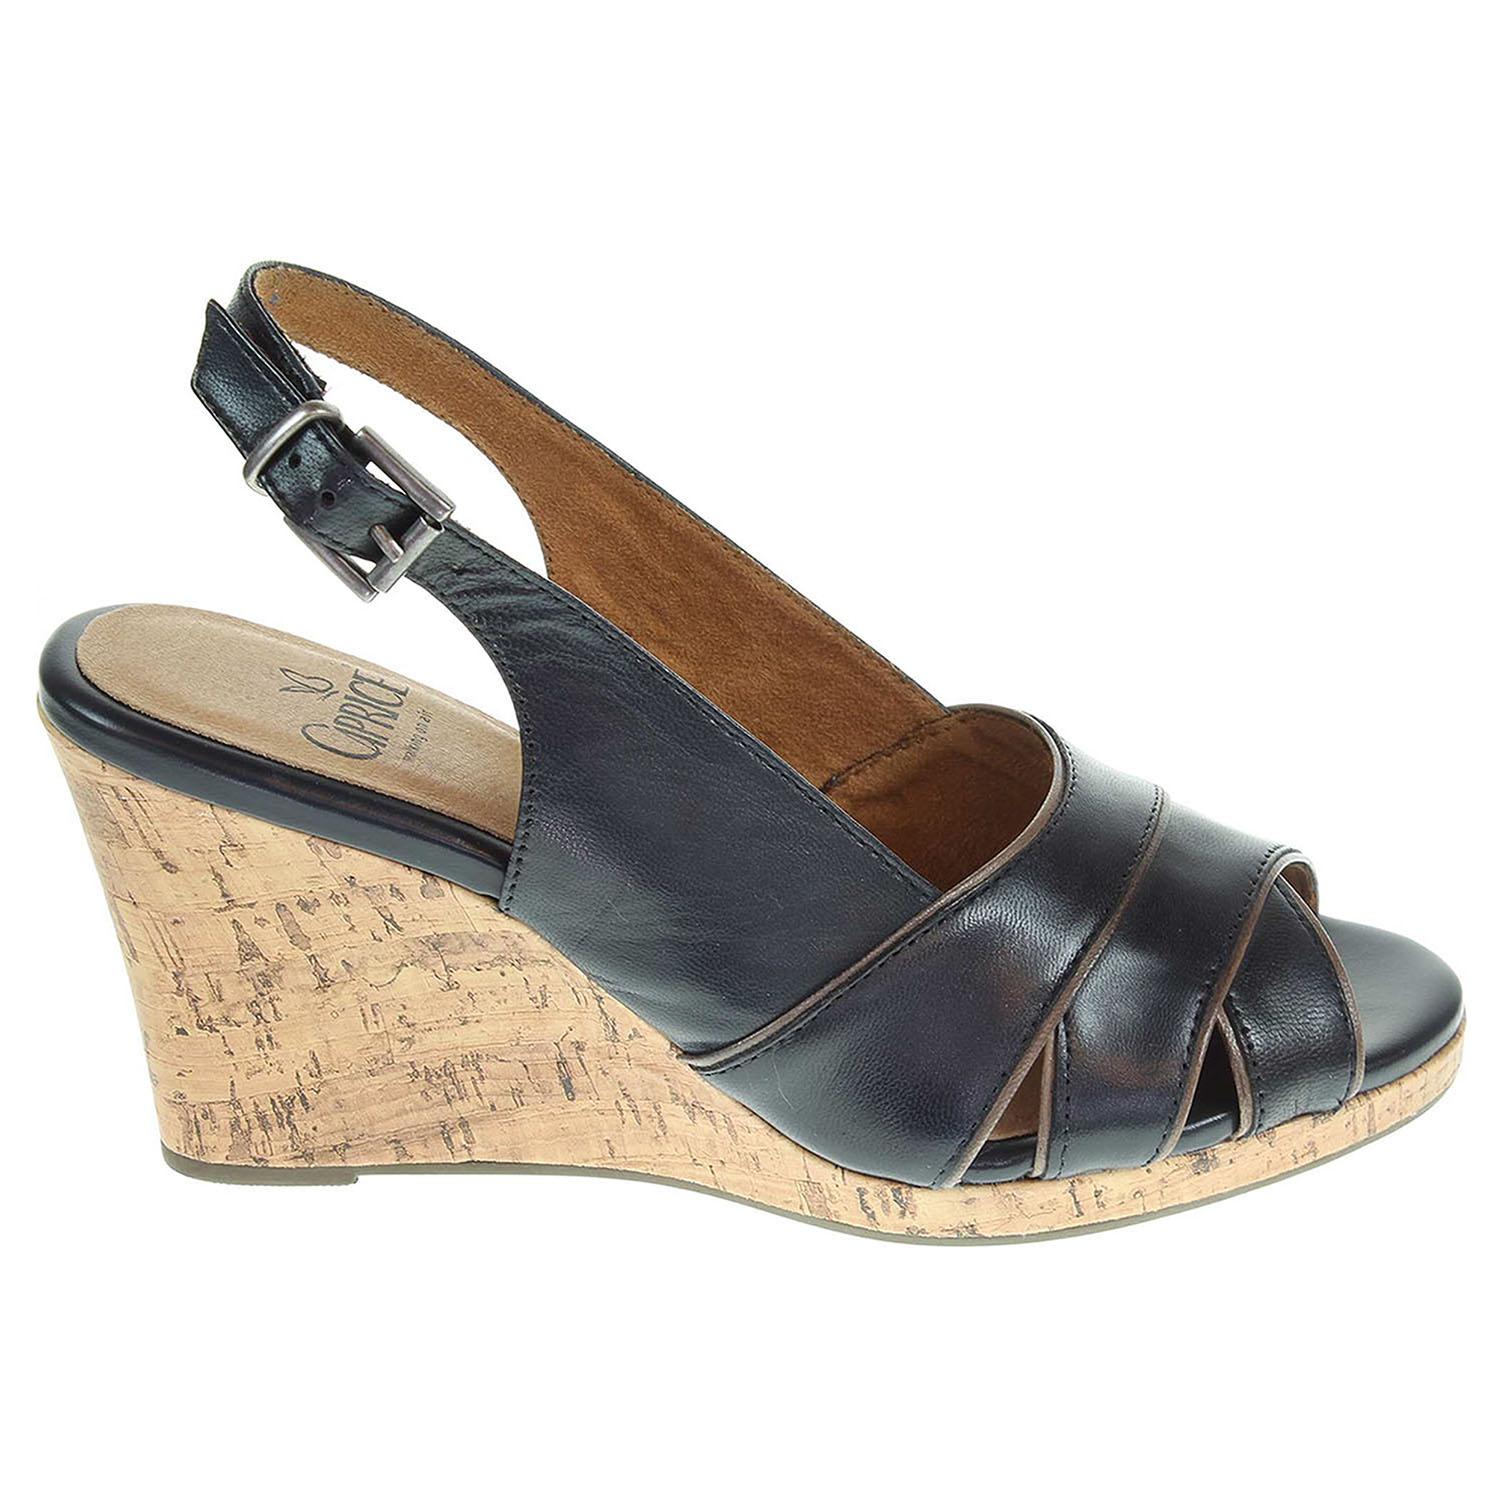 Ecco Caprice dámské sandály 9-28307-34 modré 23800945